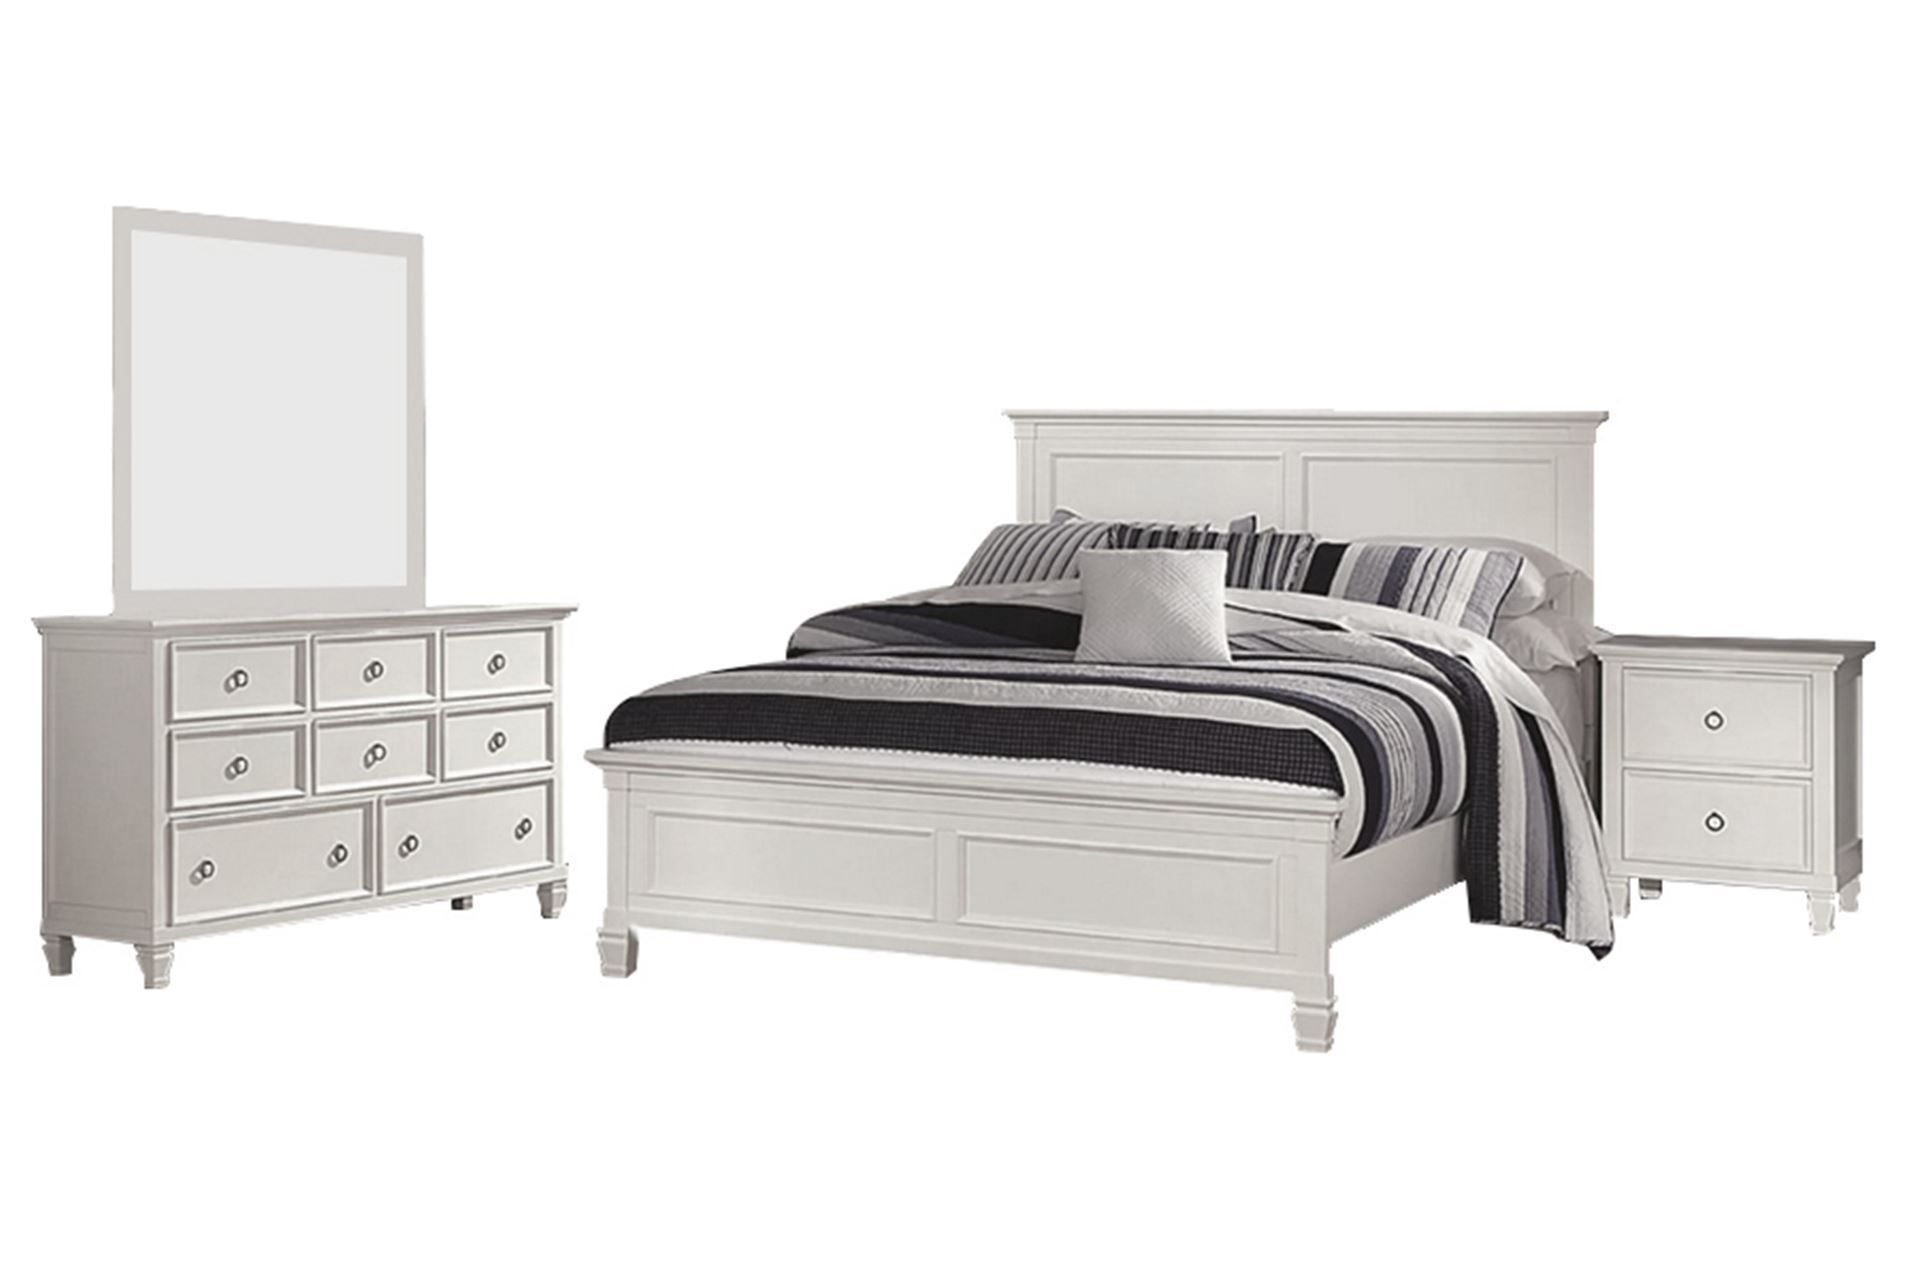 Albany Queen 8 Piece Bedroom Set  Living spaces furniture